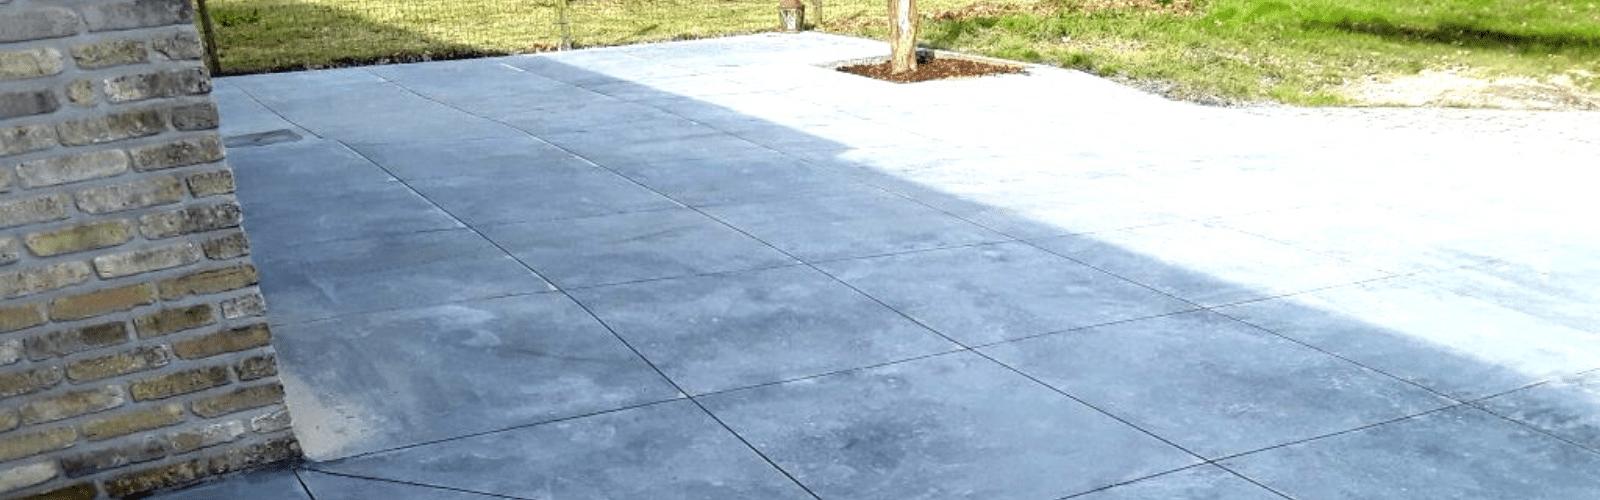 terras in gepolierde beton